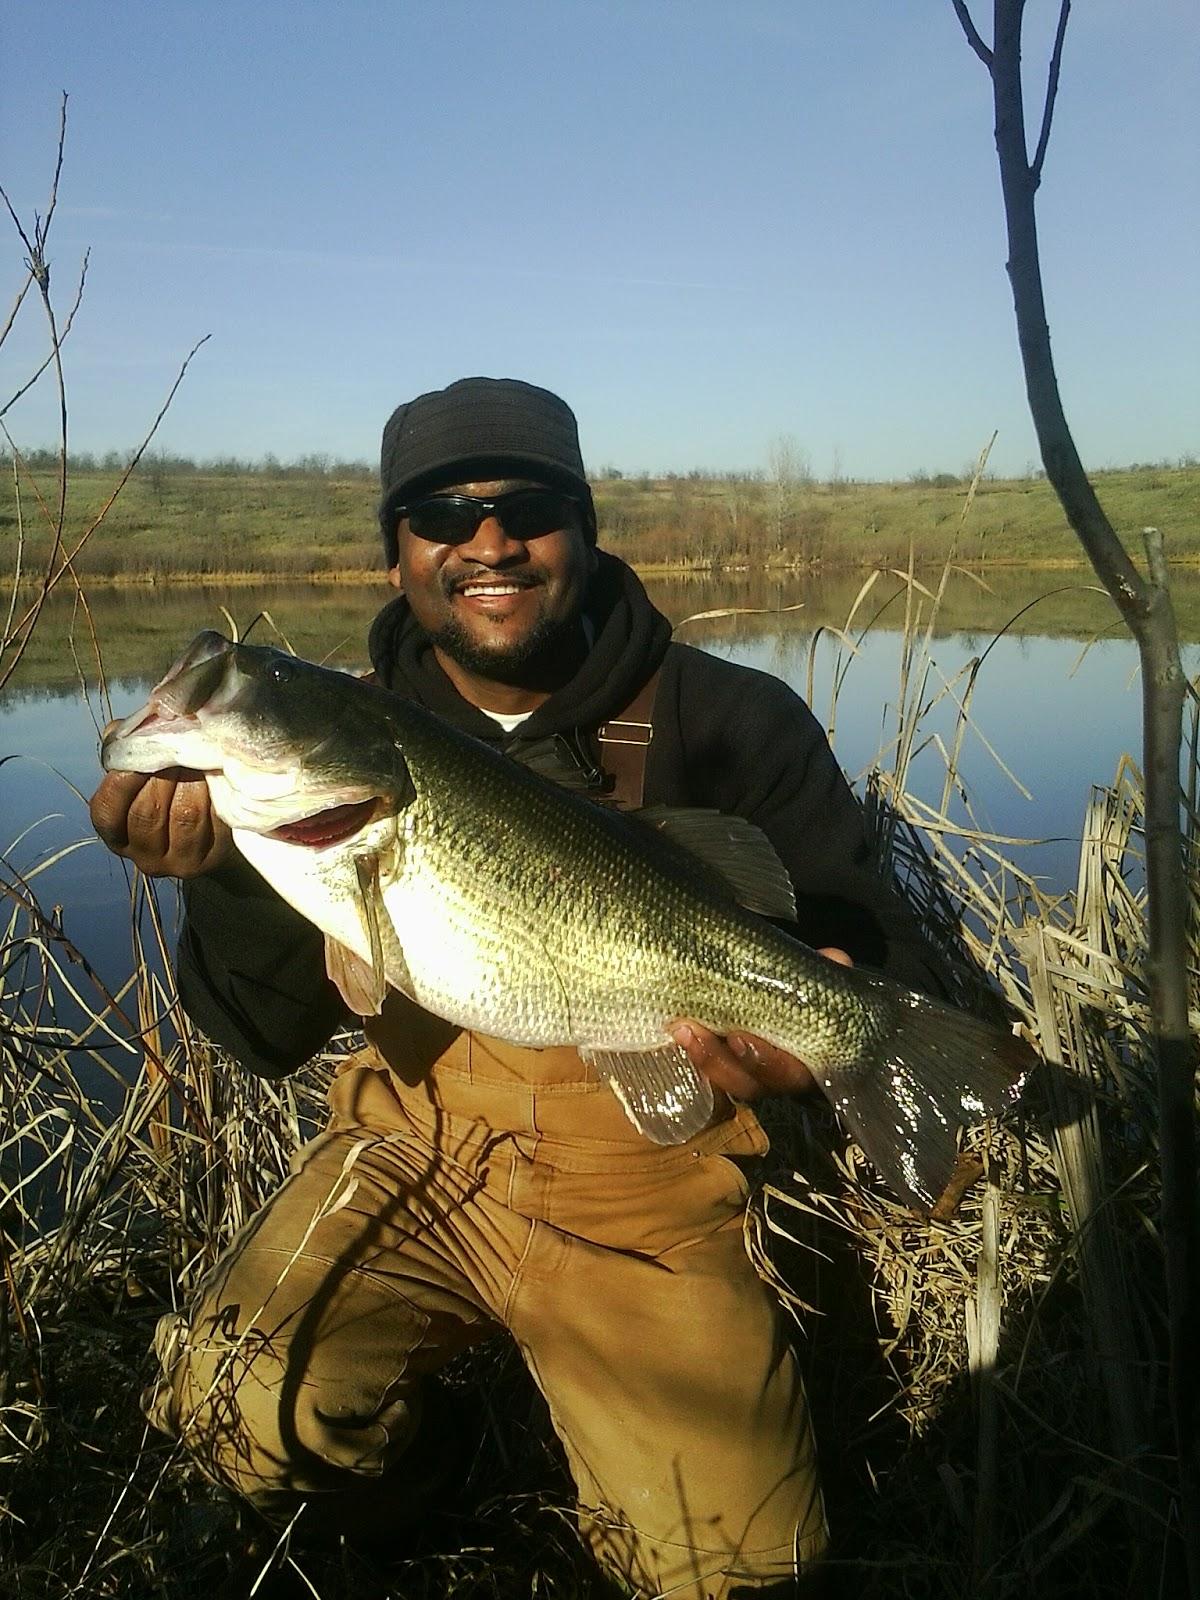 Venom lures braggin board fall bass 2012 for Fall bass fishing lures